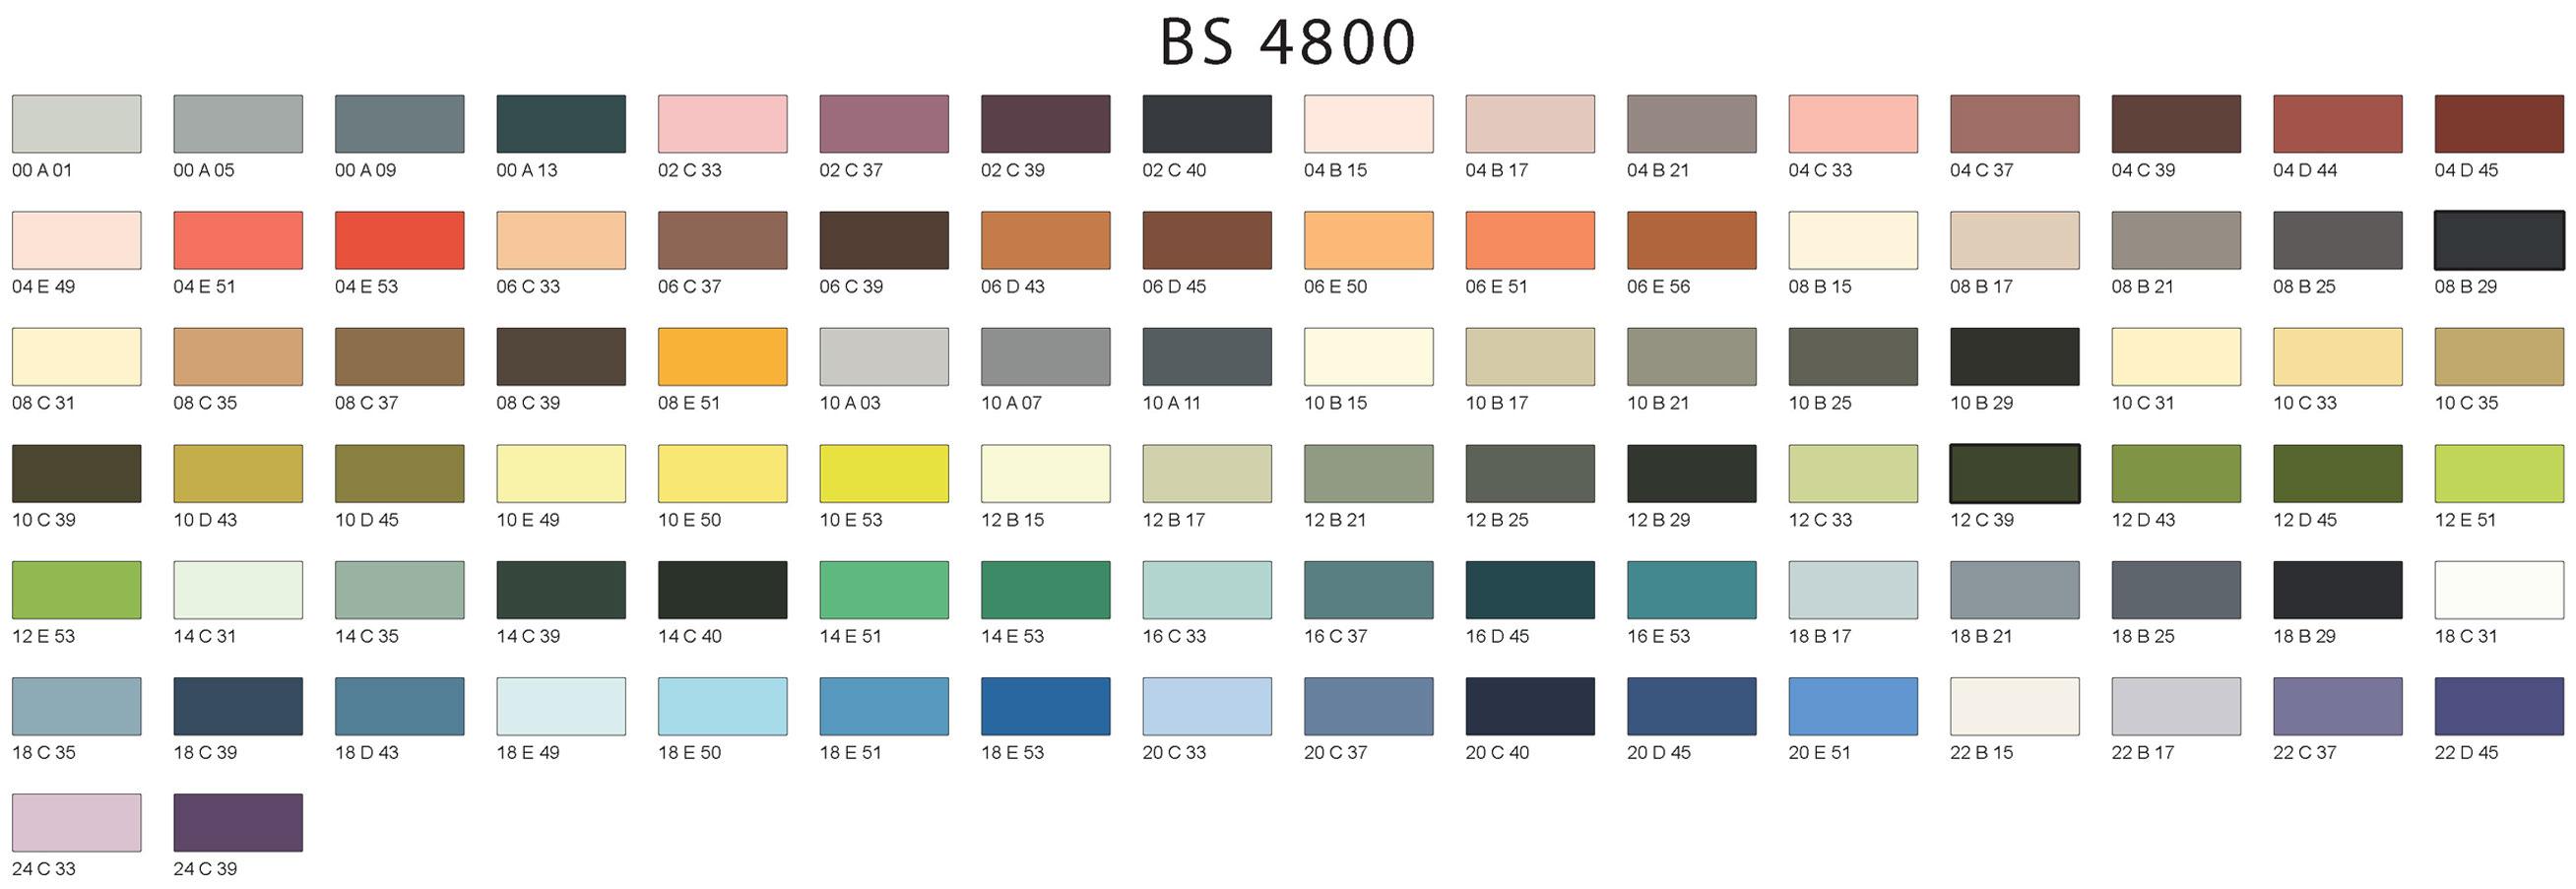 Powder coating colour charts 381c ral 4800 devon powder coating bs 4800 powder coating colour charts nvjuhfo Images